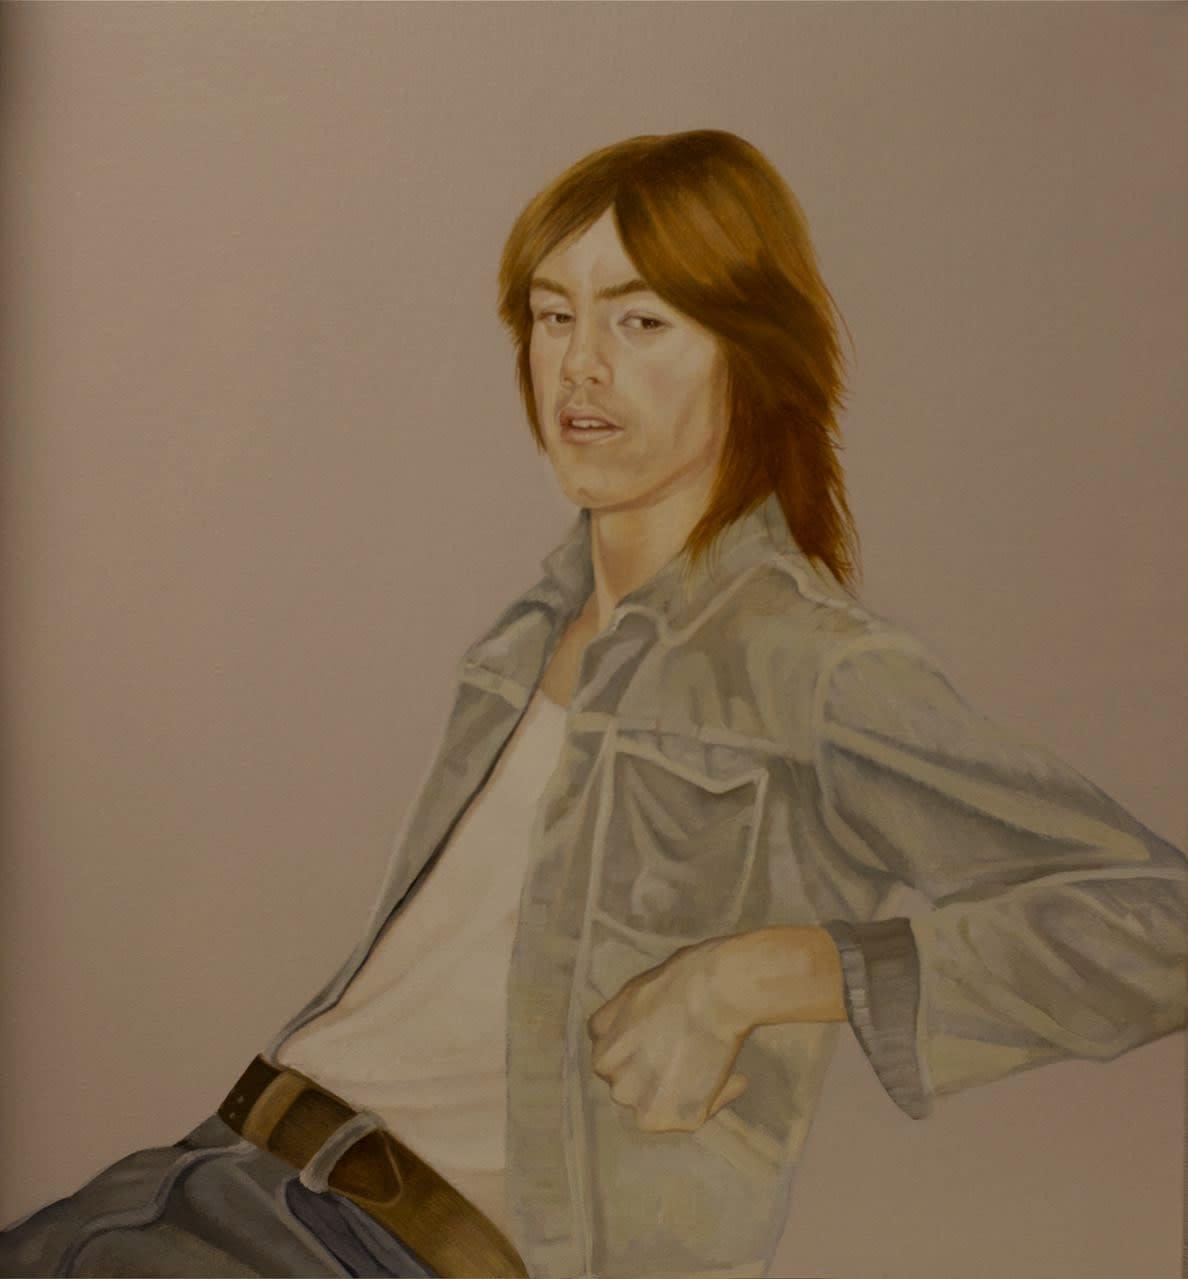 Grace O'Connor Woodlawn Terrace, 2009 Oil on Linen 61 x 55.9 cm 24 x 22 in